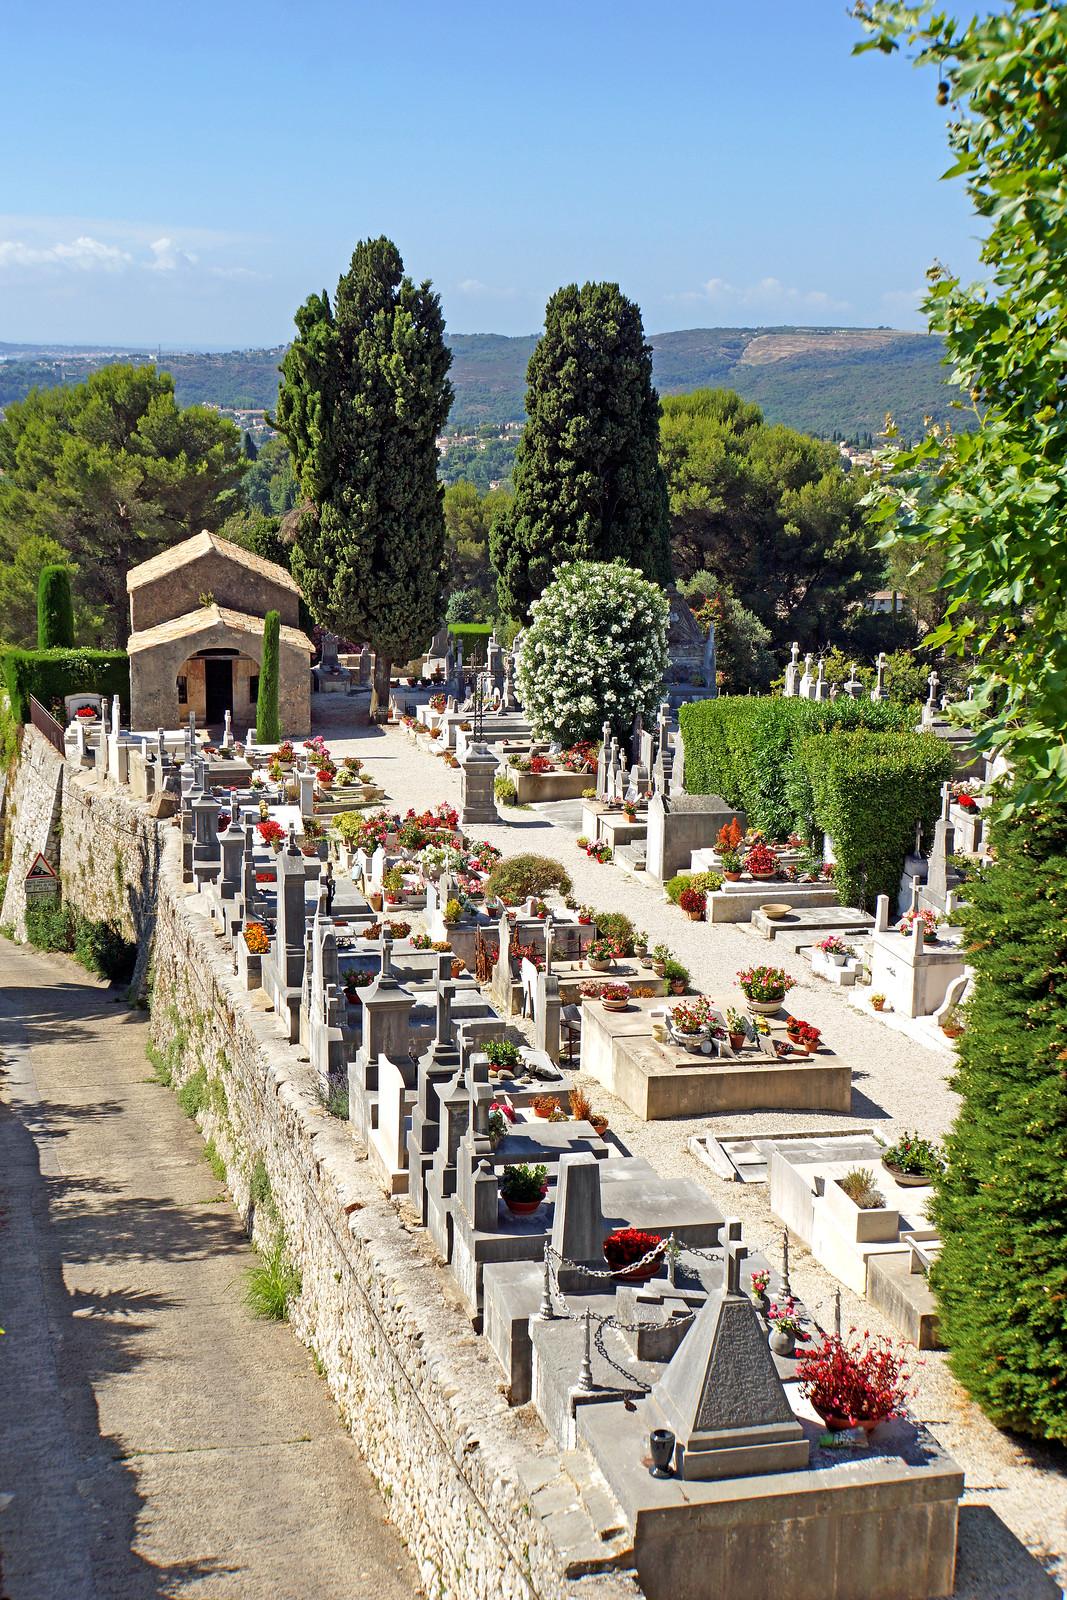 France-002656 - Cemetery